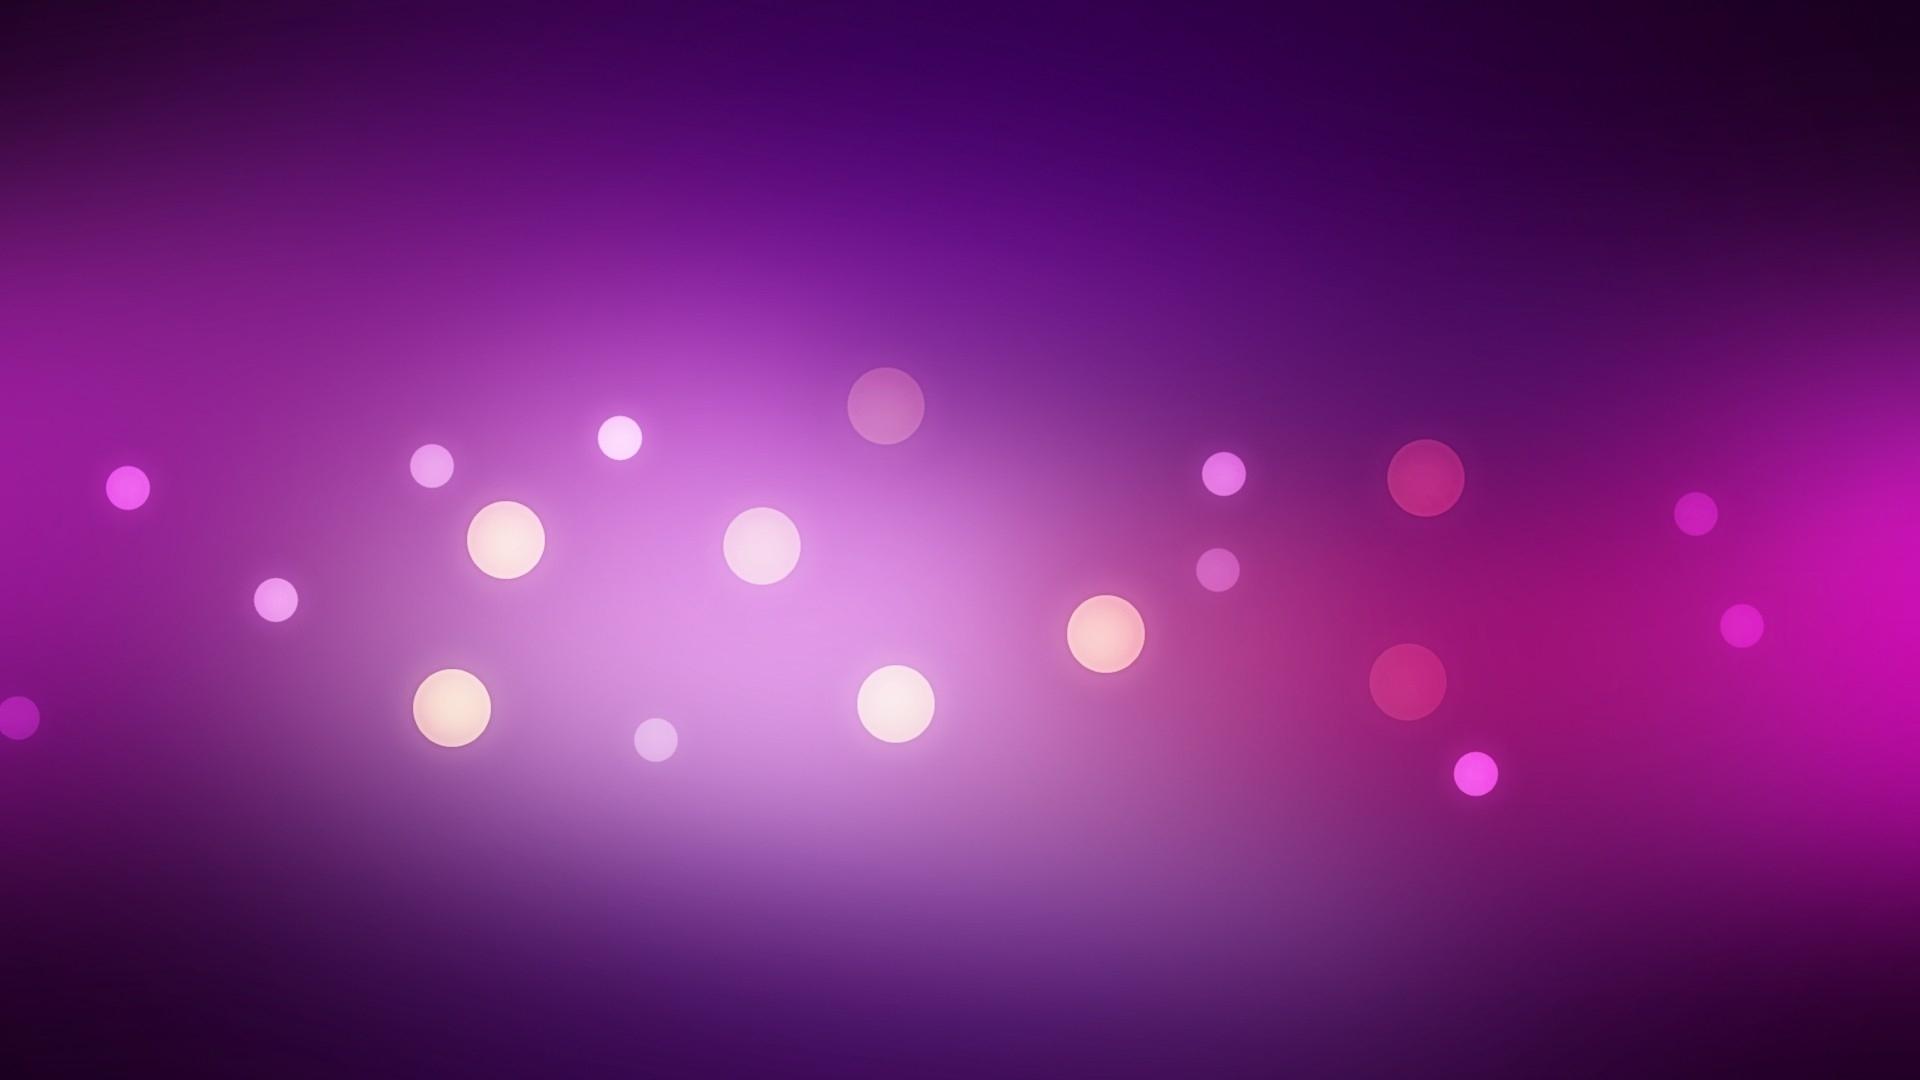 Purple Circles Abstract HD Desktop Wallpaper HD Desktop Wallpaper 1920x1080